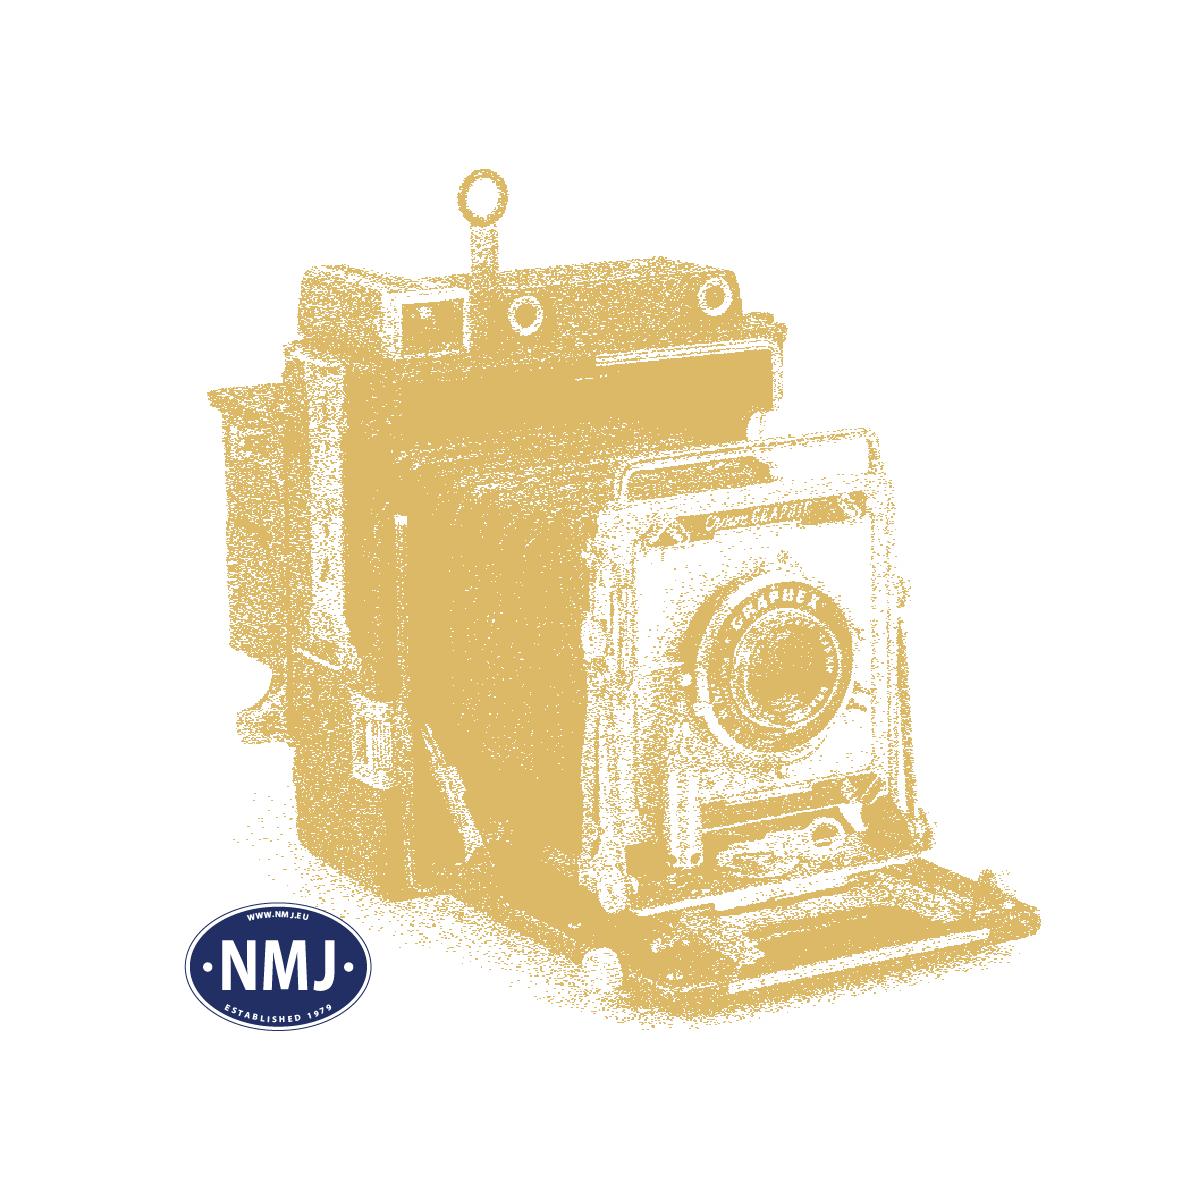 NOC15923 - Nikolausdagen